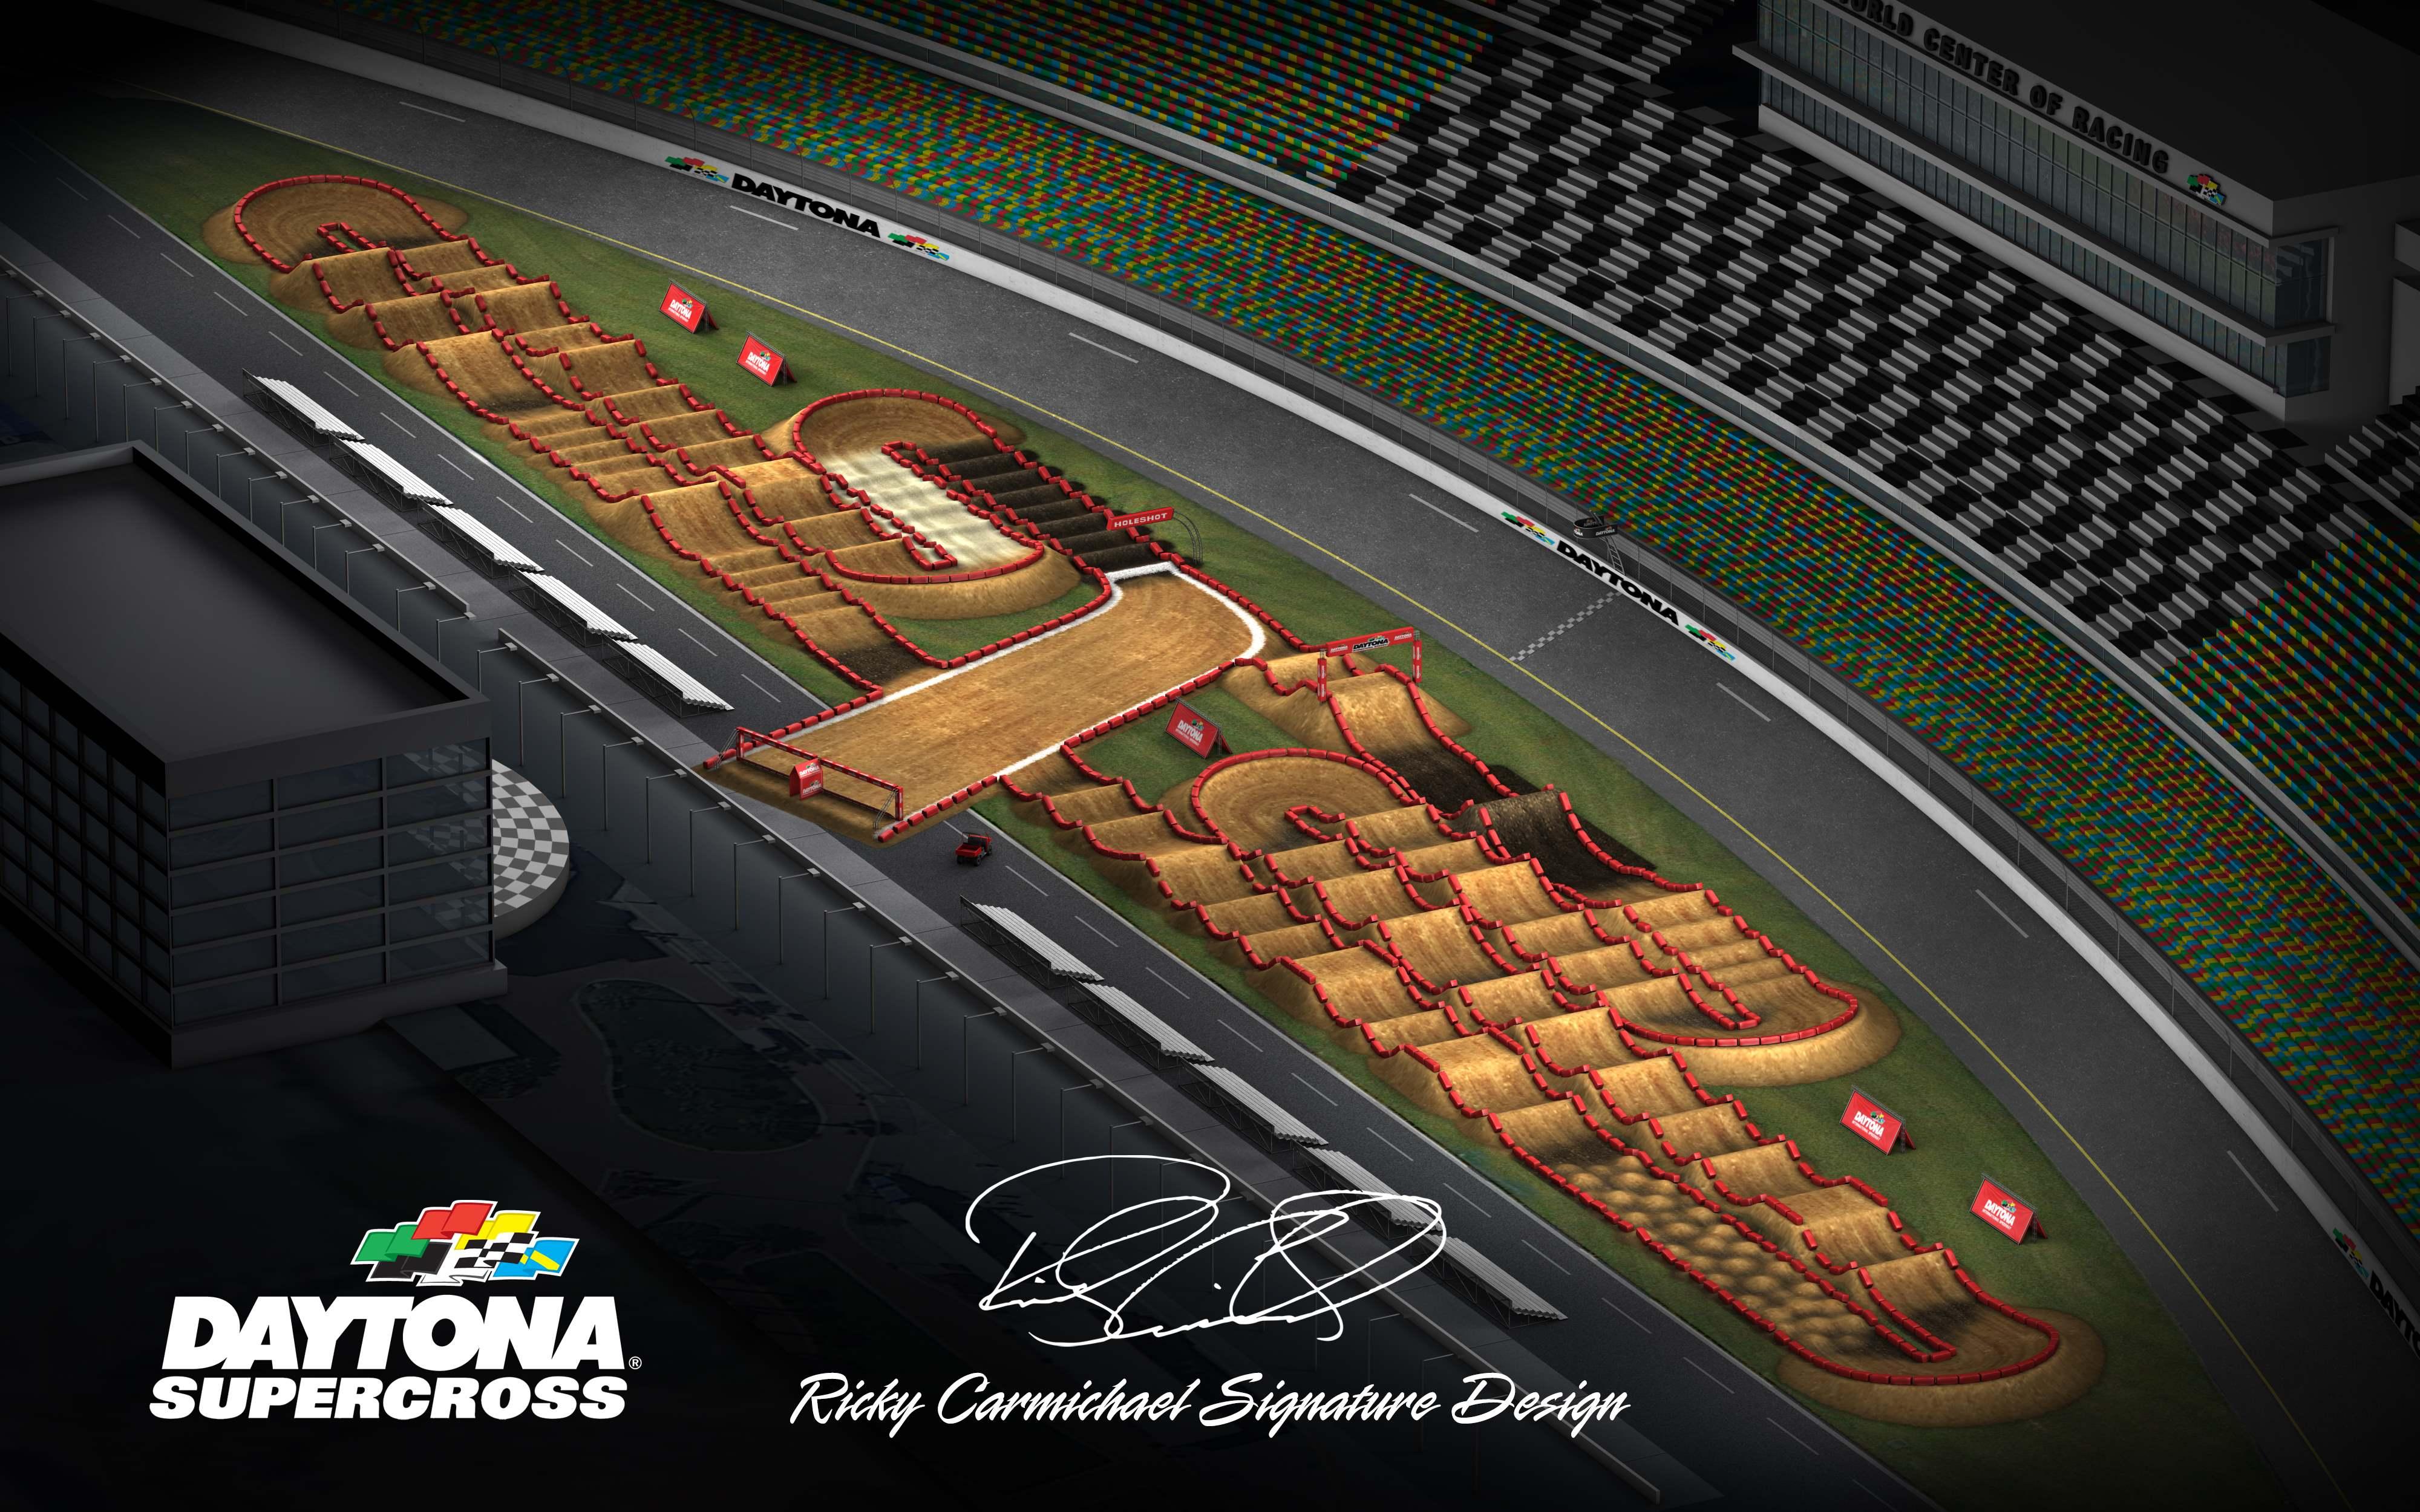 2019 Daytona Supercross course map